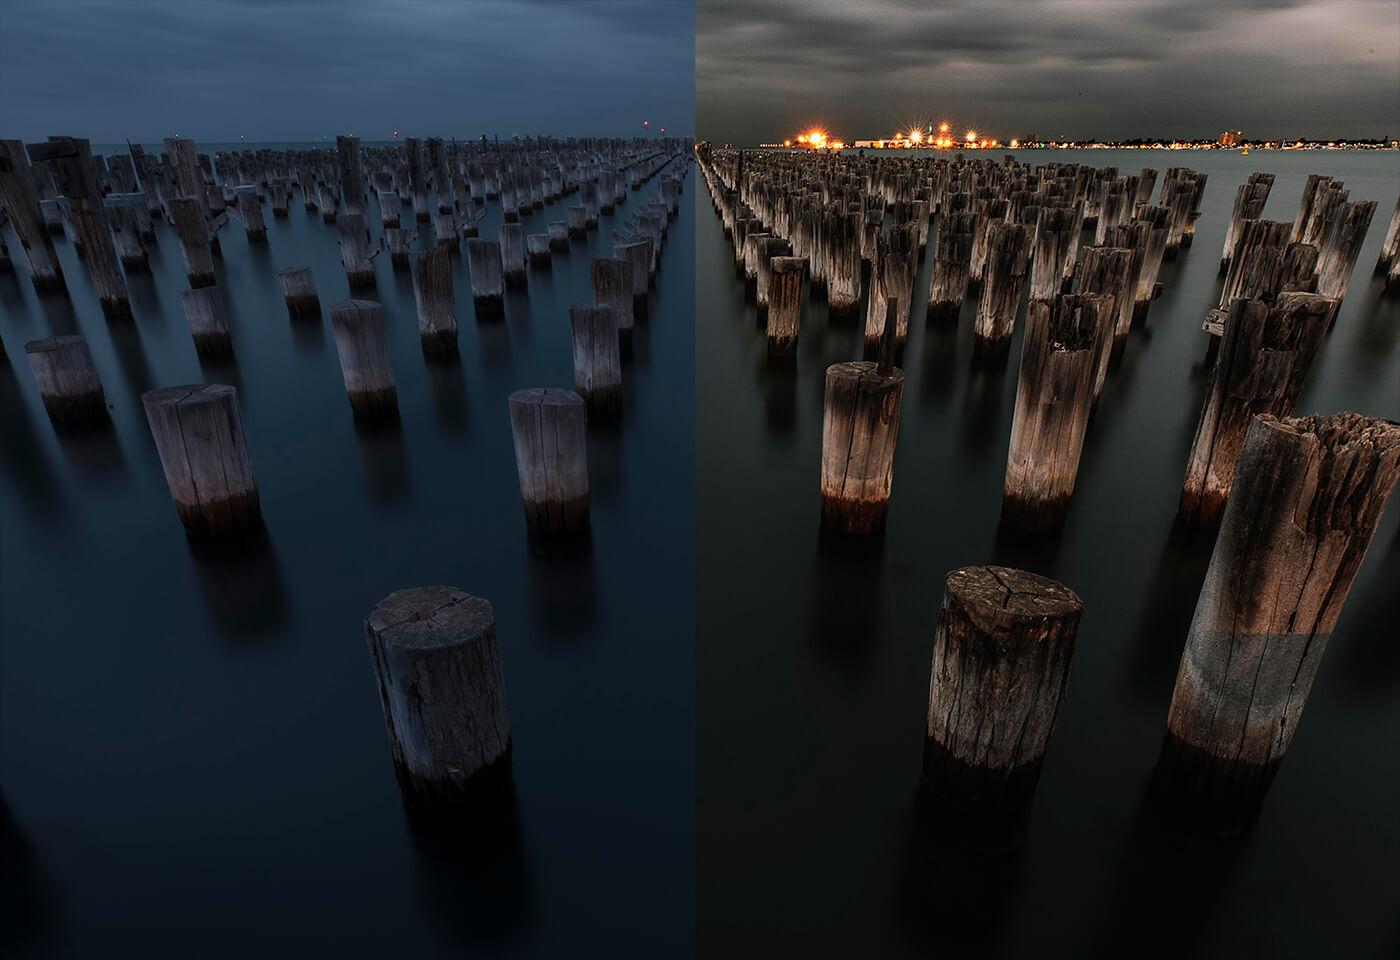 Comparison image of edit